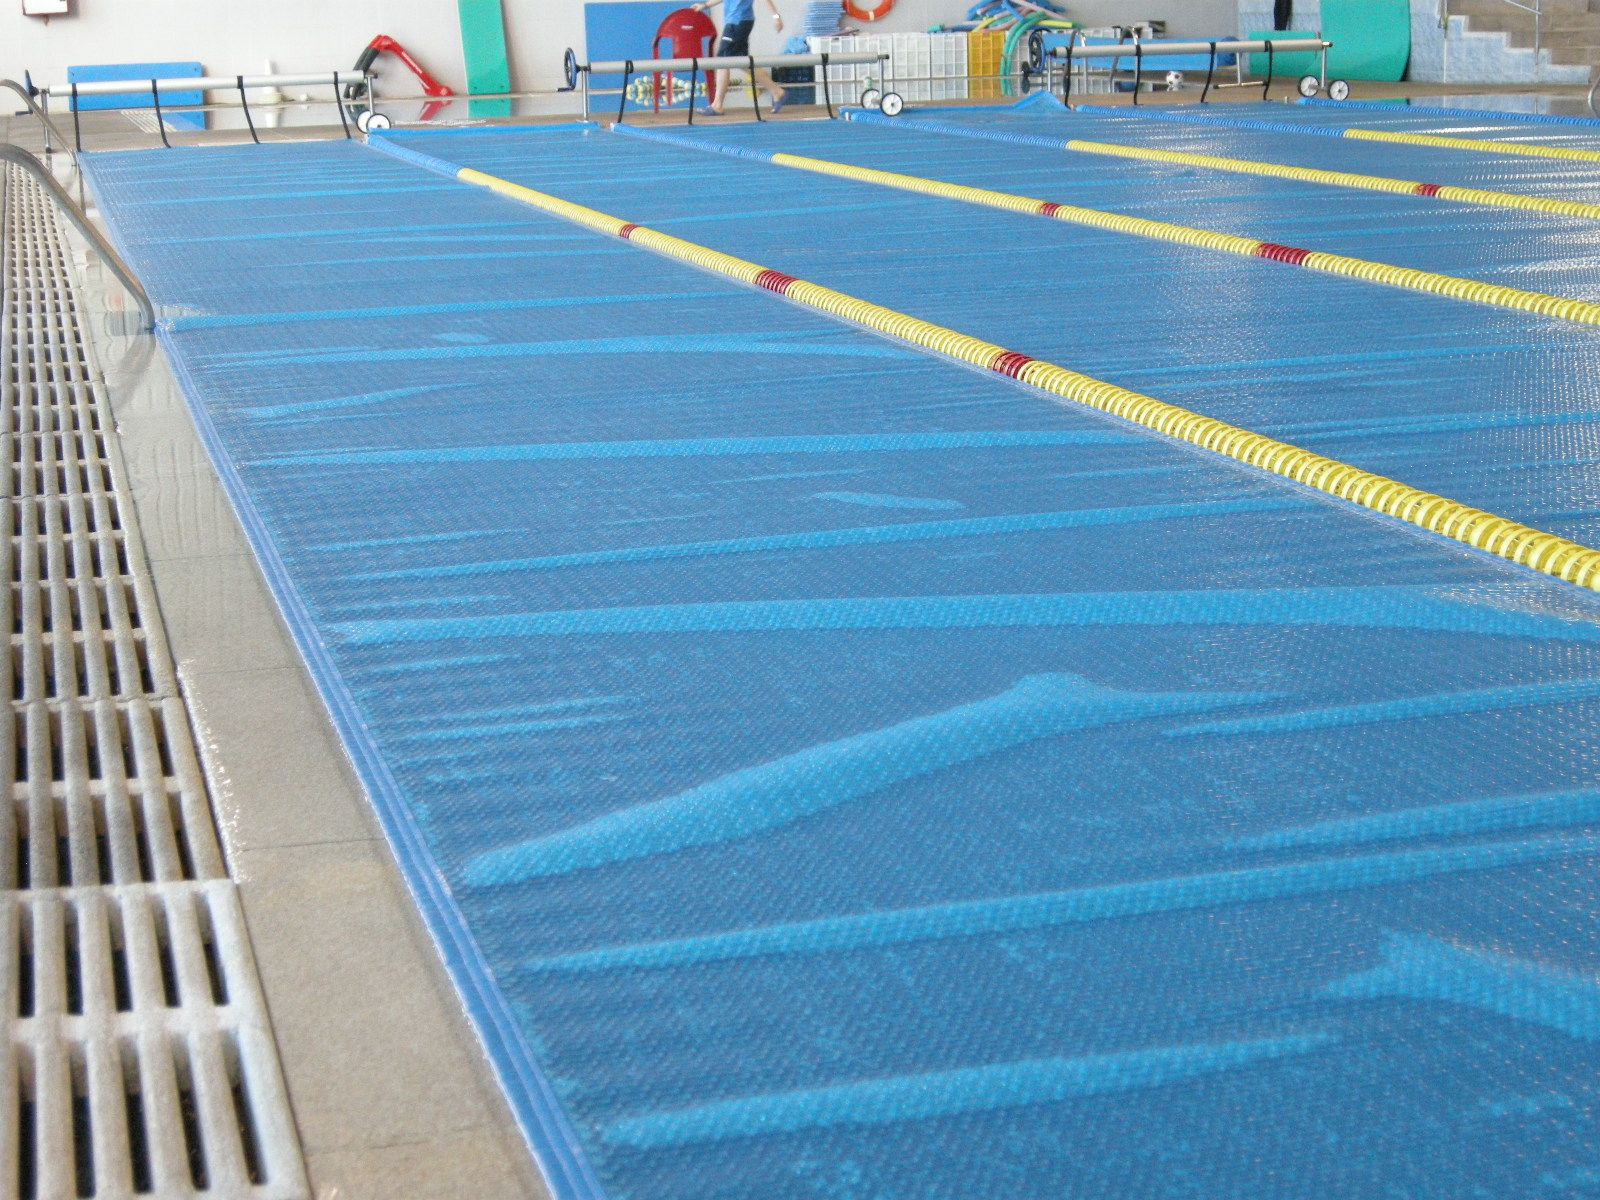 Piscinas p blicas cobertor solar iber coverpool for Cobertor solar piscina